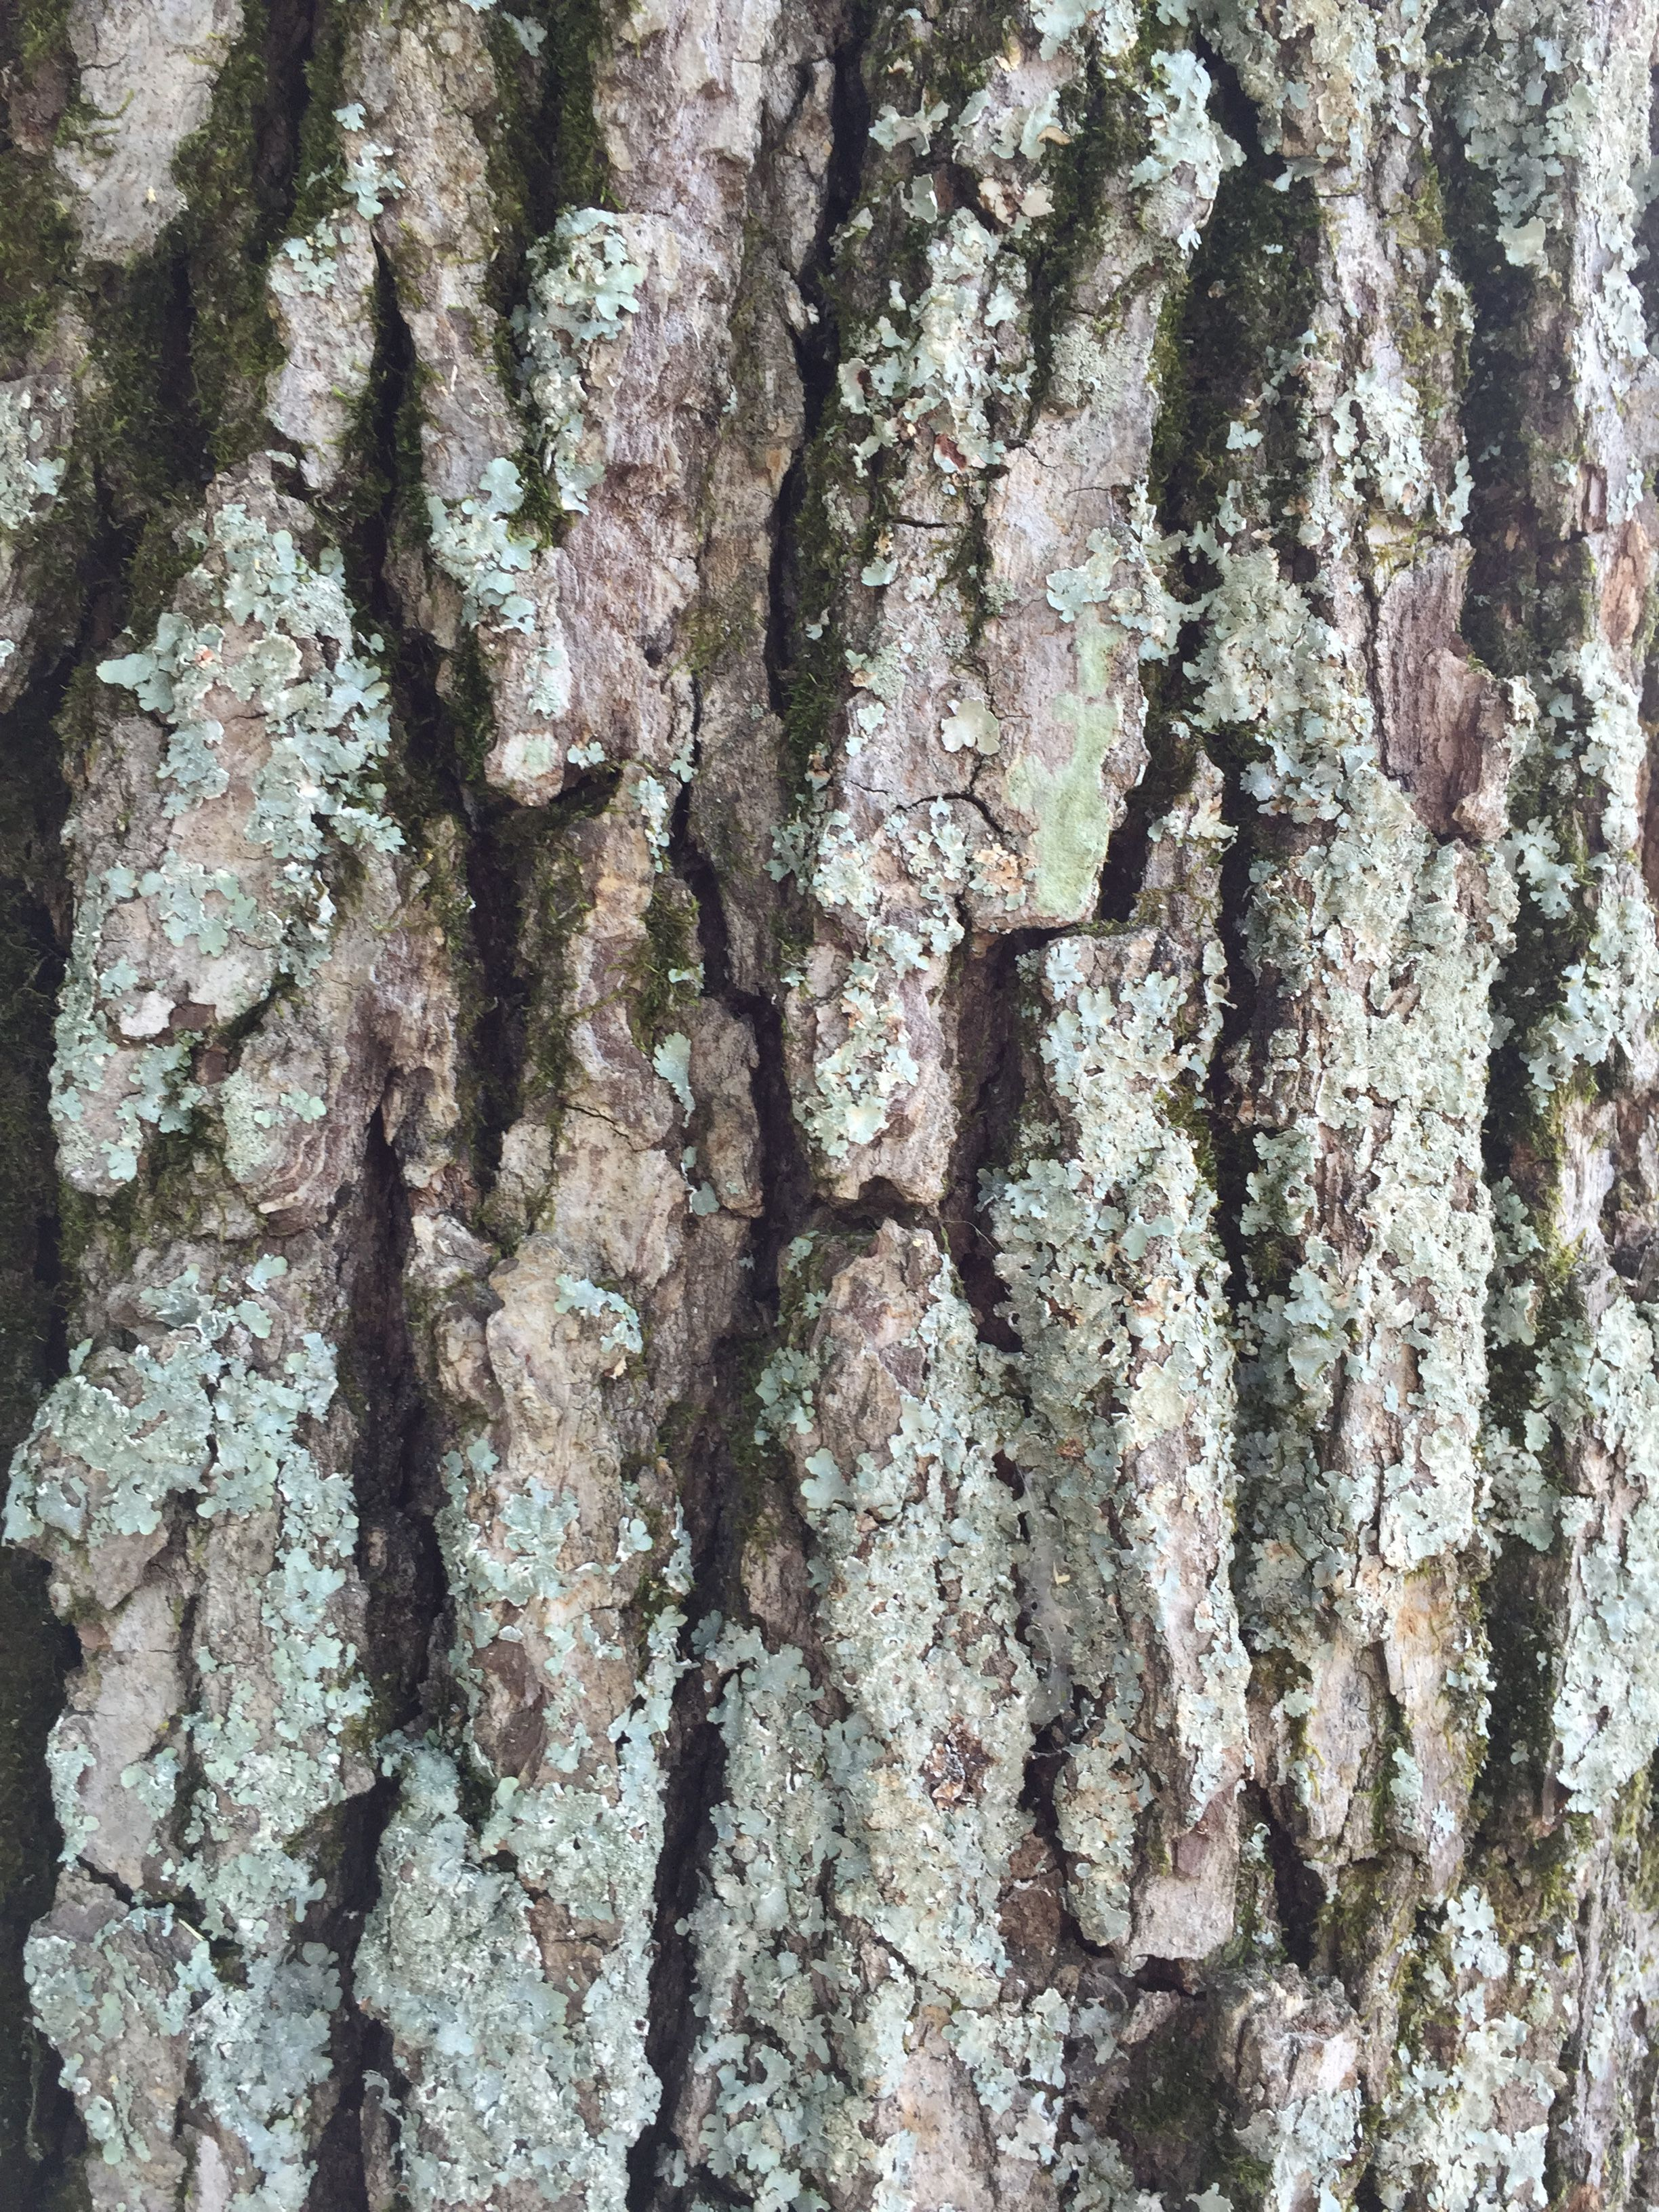 Oak Tree Bark Tree Textures Oak Tree Drawings Oak Tree Bark